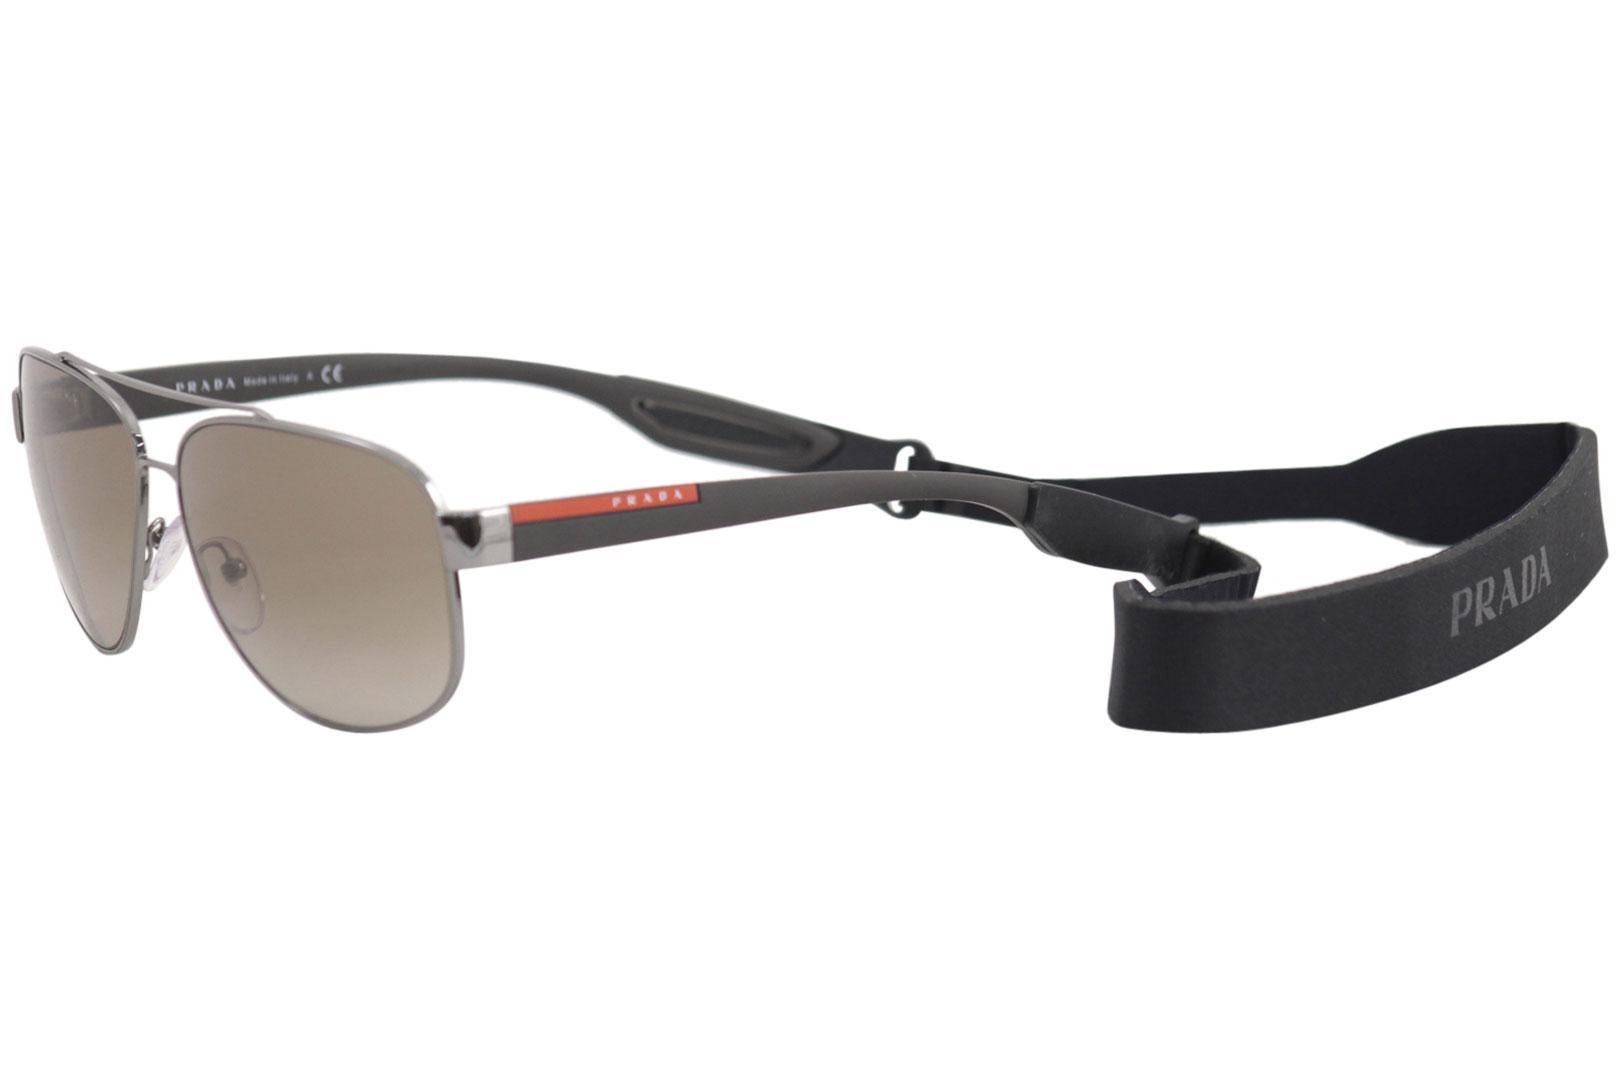 86092a91f24b8 Details about Prada Linea Rossa SPS58Q SPS 58Q 5AV1X1 Gunmetal Pilot Polarized  Sunglasses 63mm